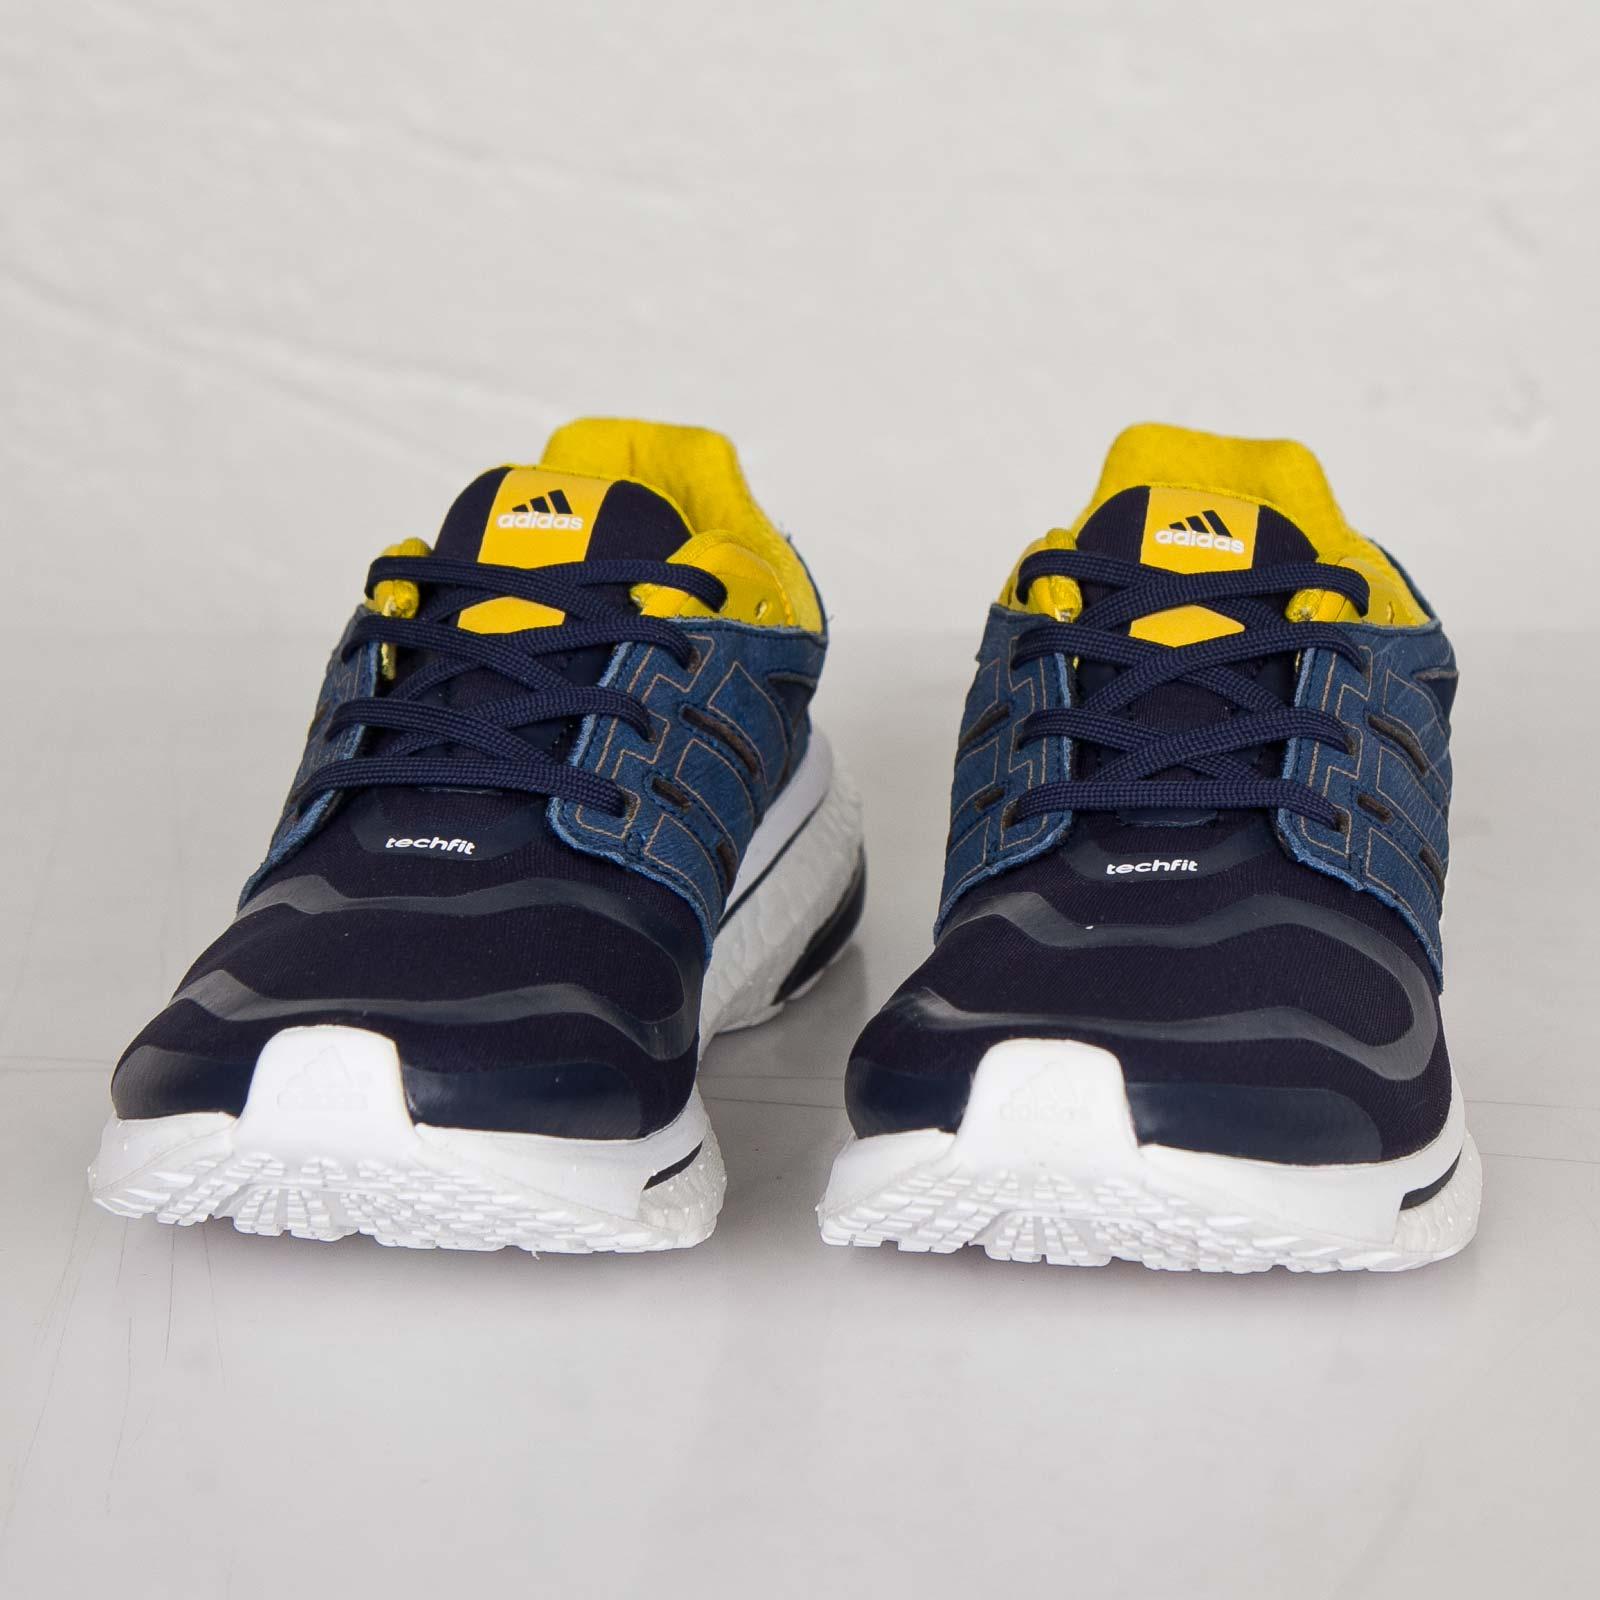 L'impulso b27203 scarpe da ginnasticanstuff scarpe adidas.